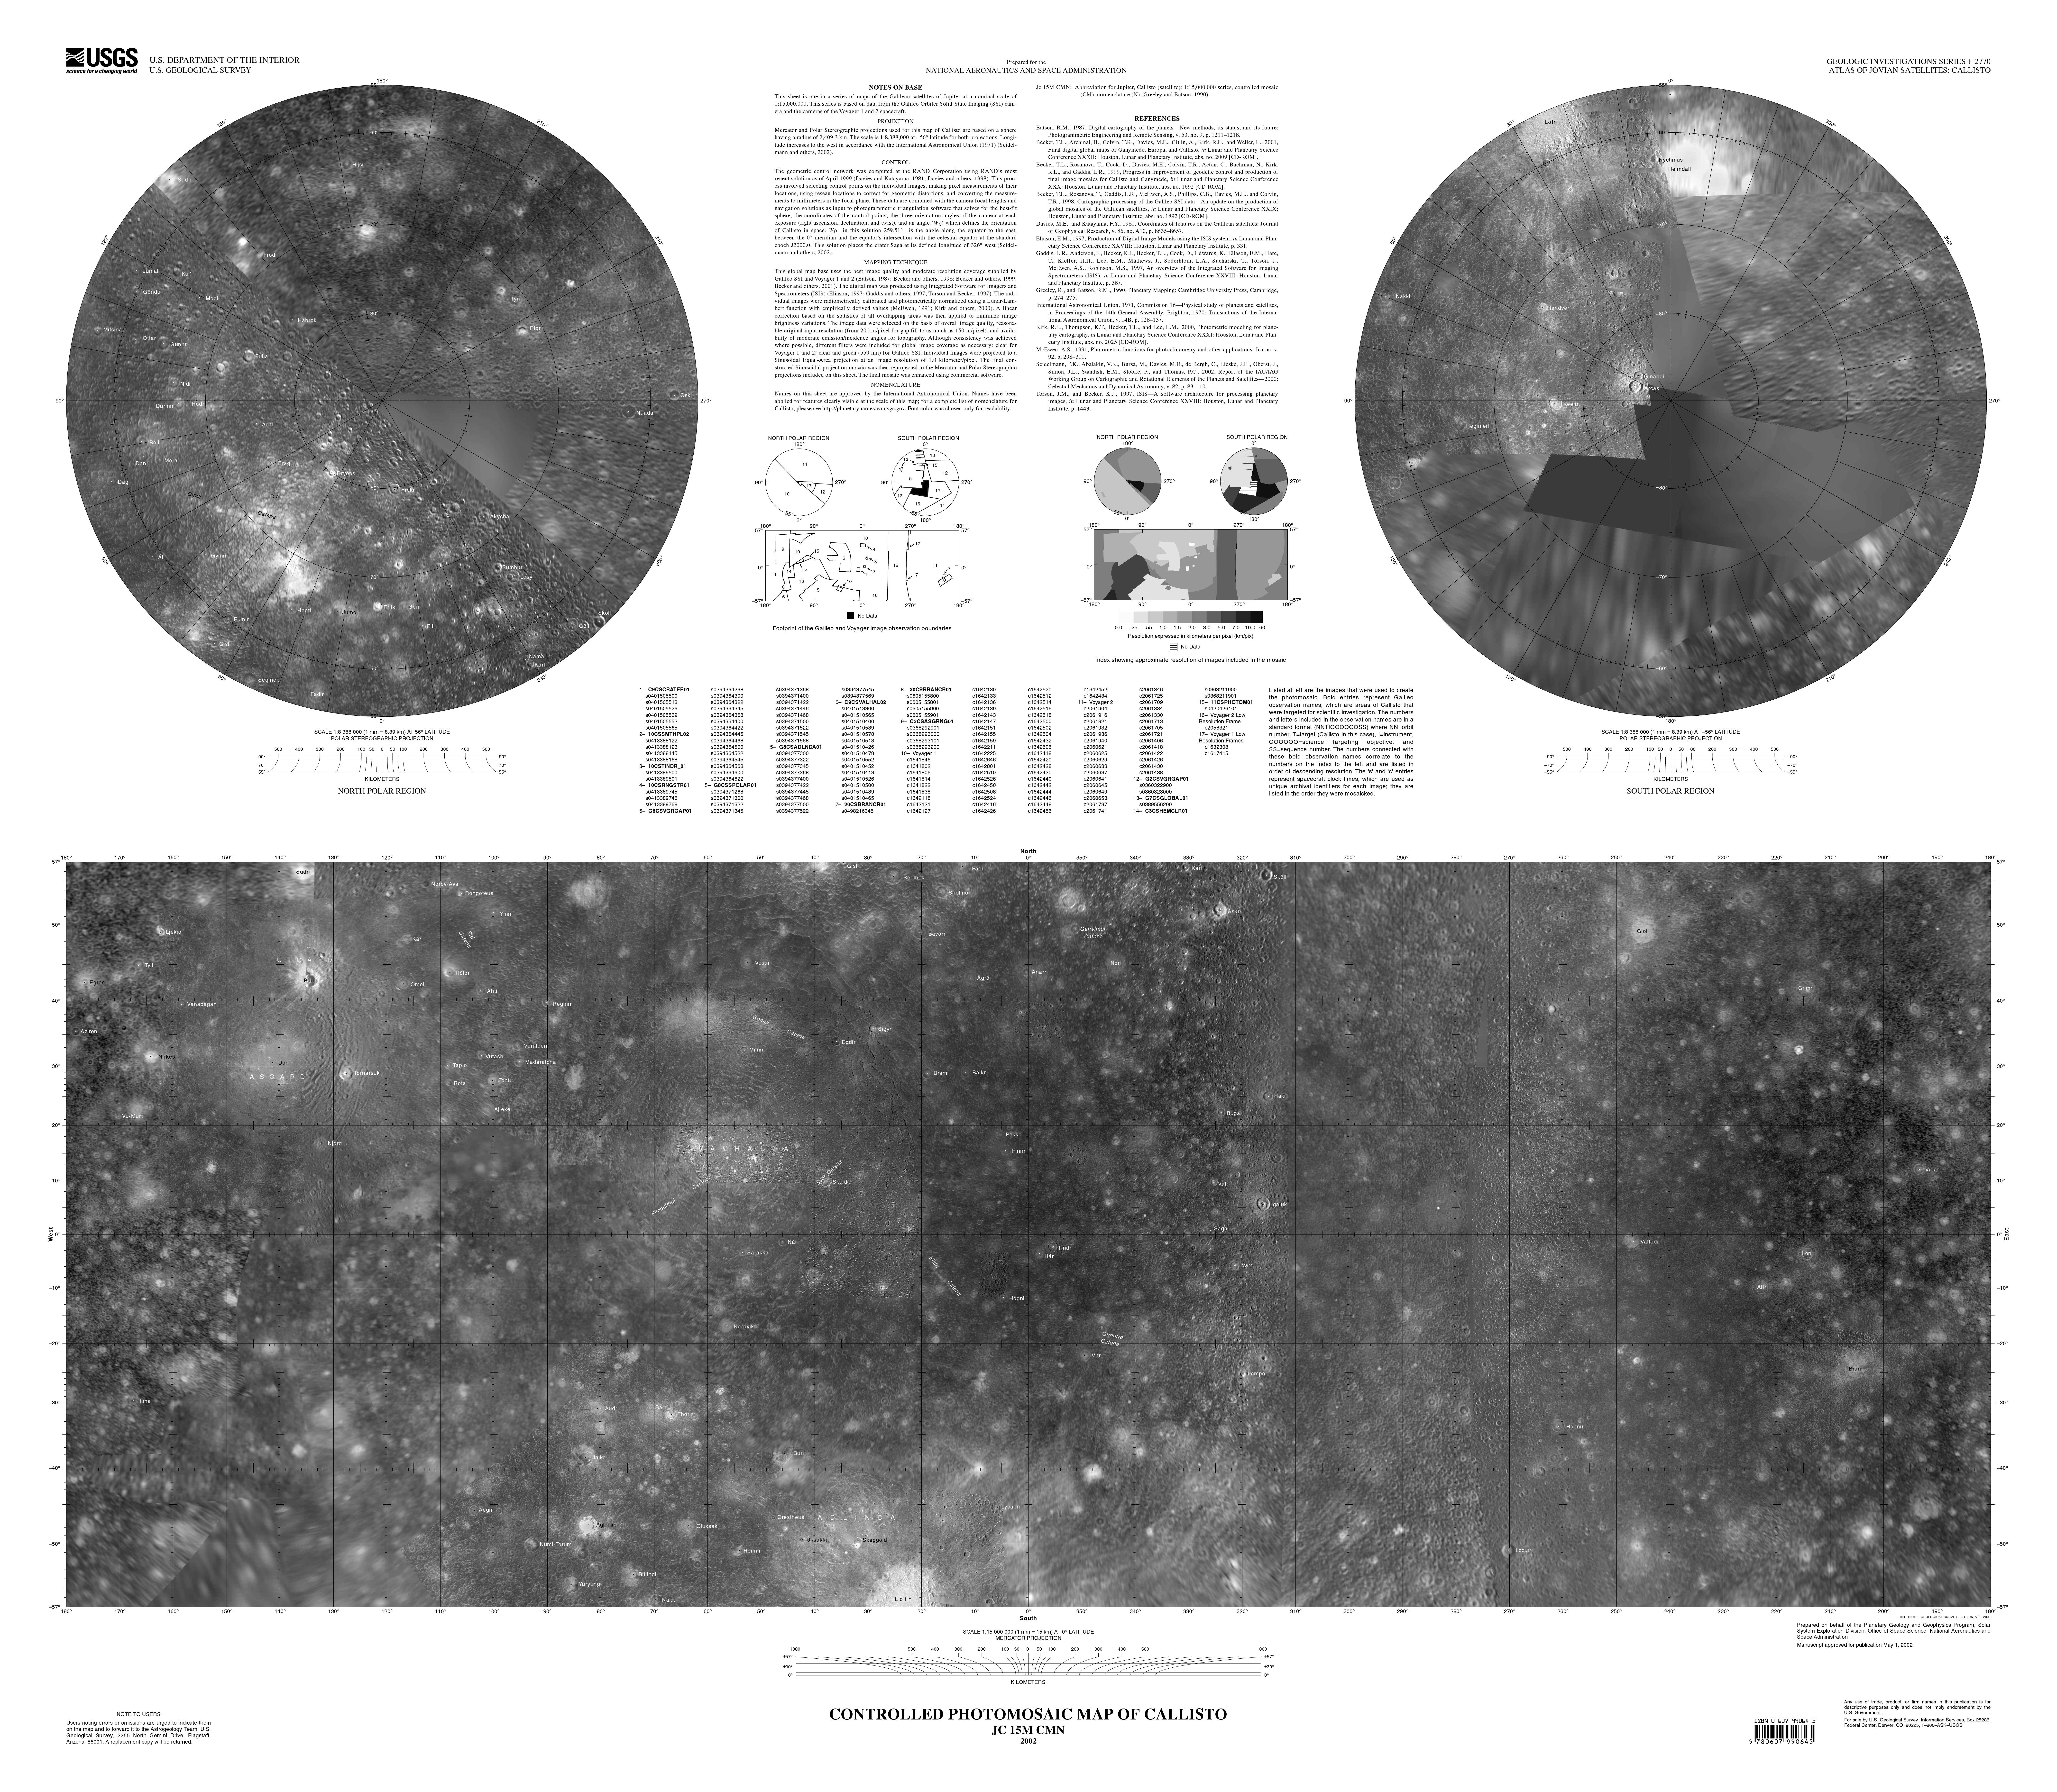 Callisto Map Google Images